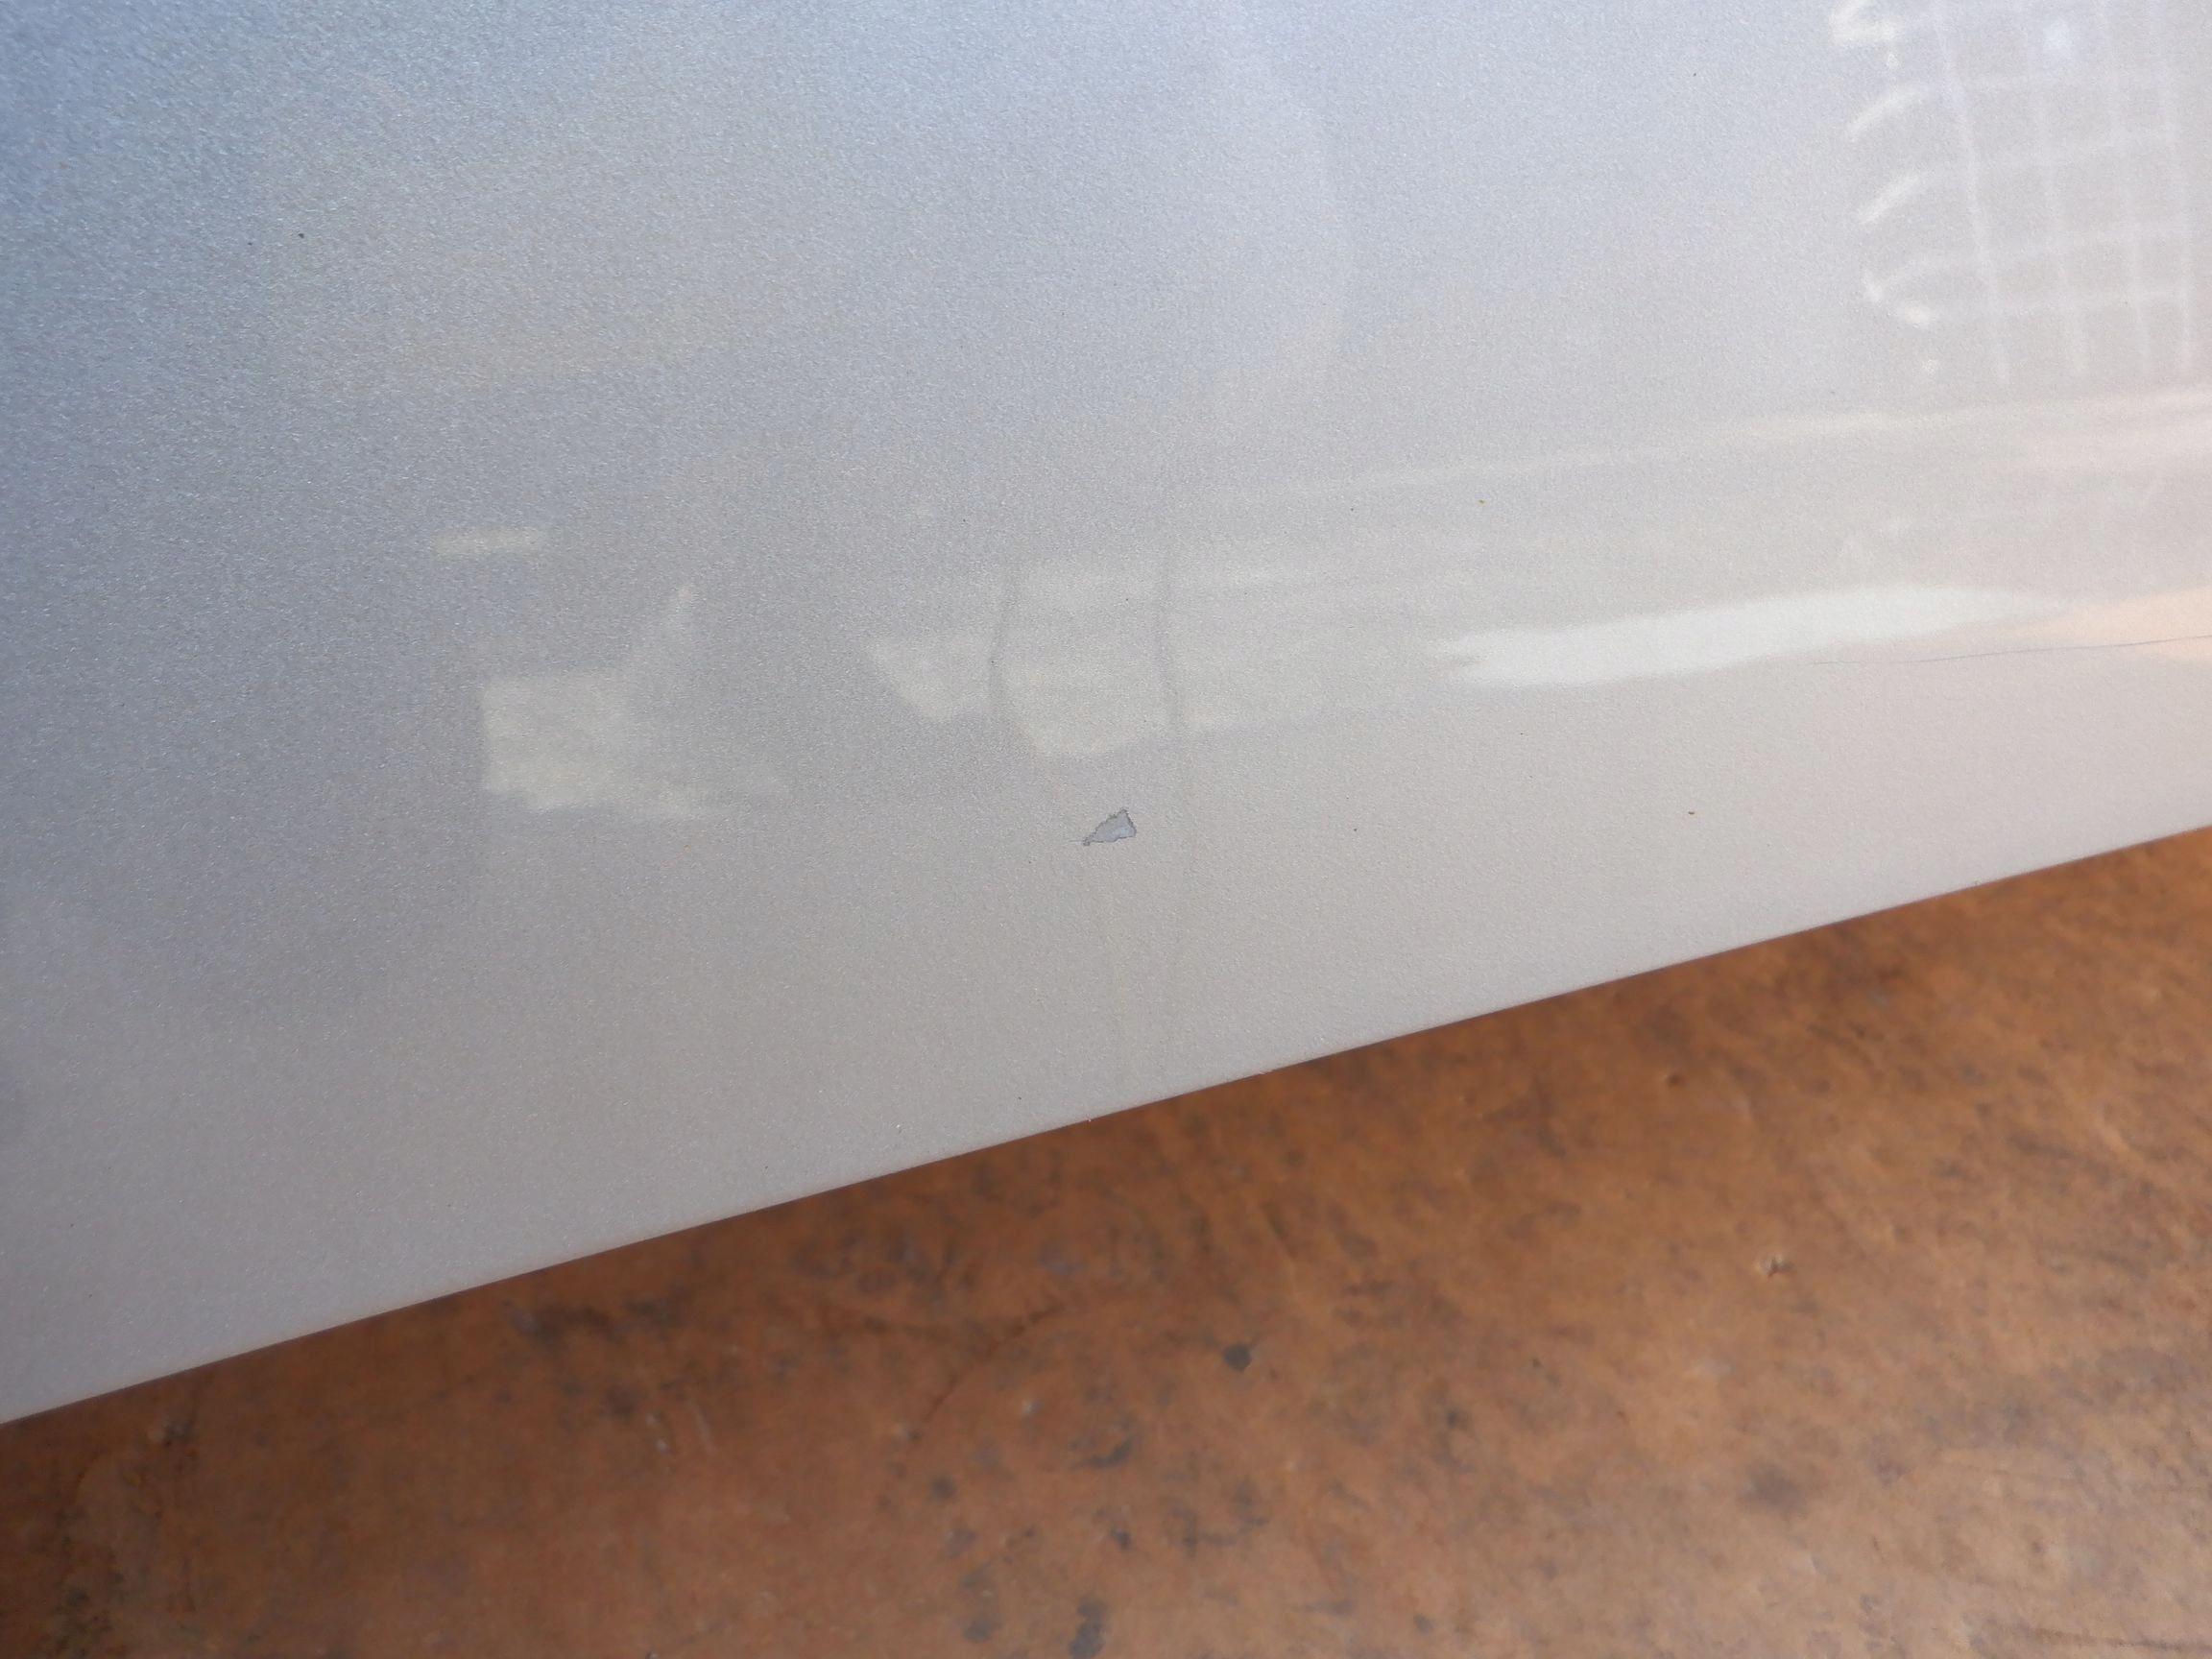 капот hood ford edge рестайлінг 2019 mondust silver, фото